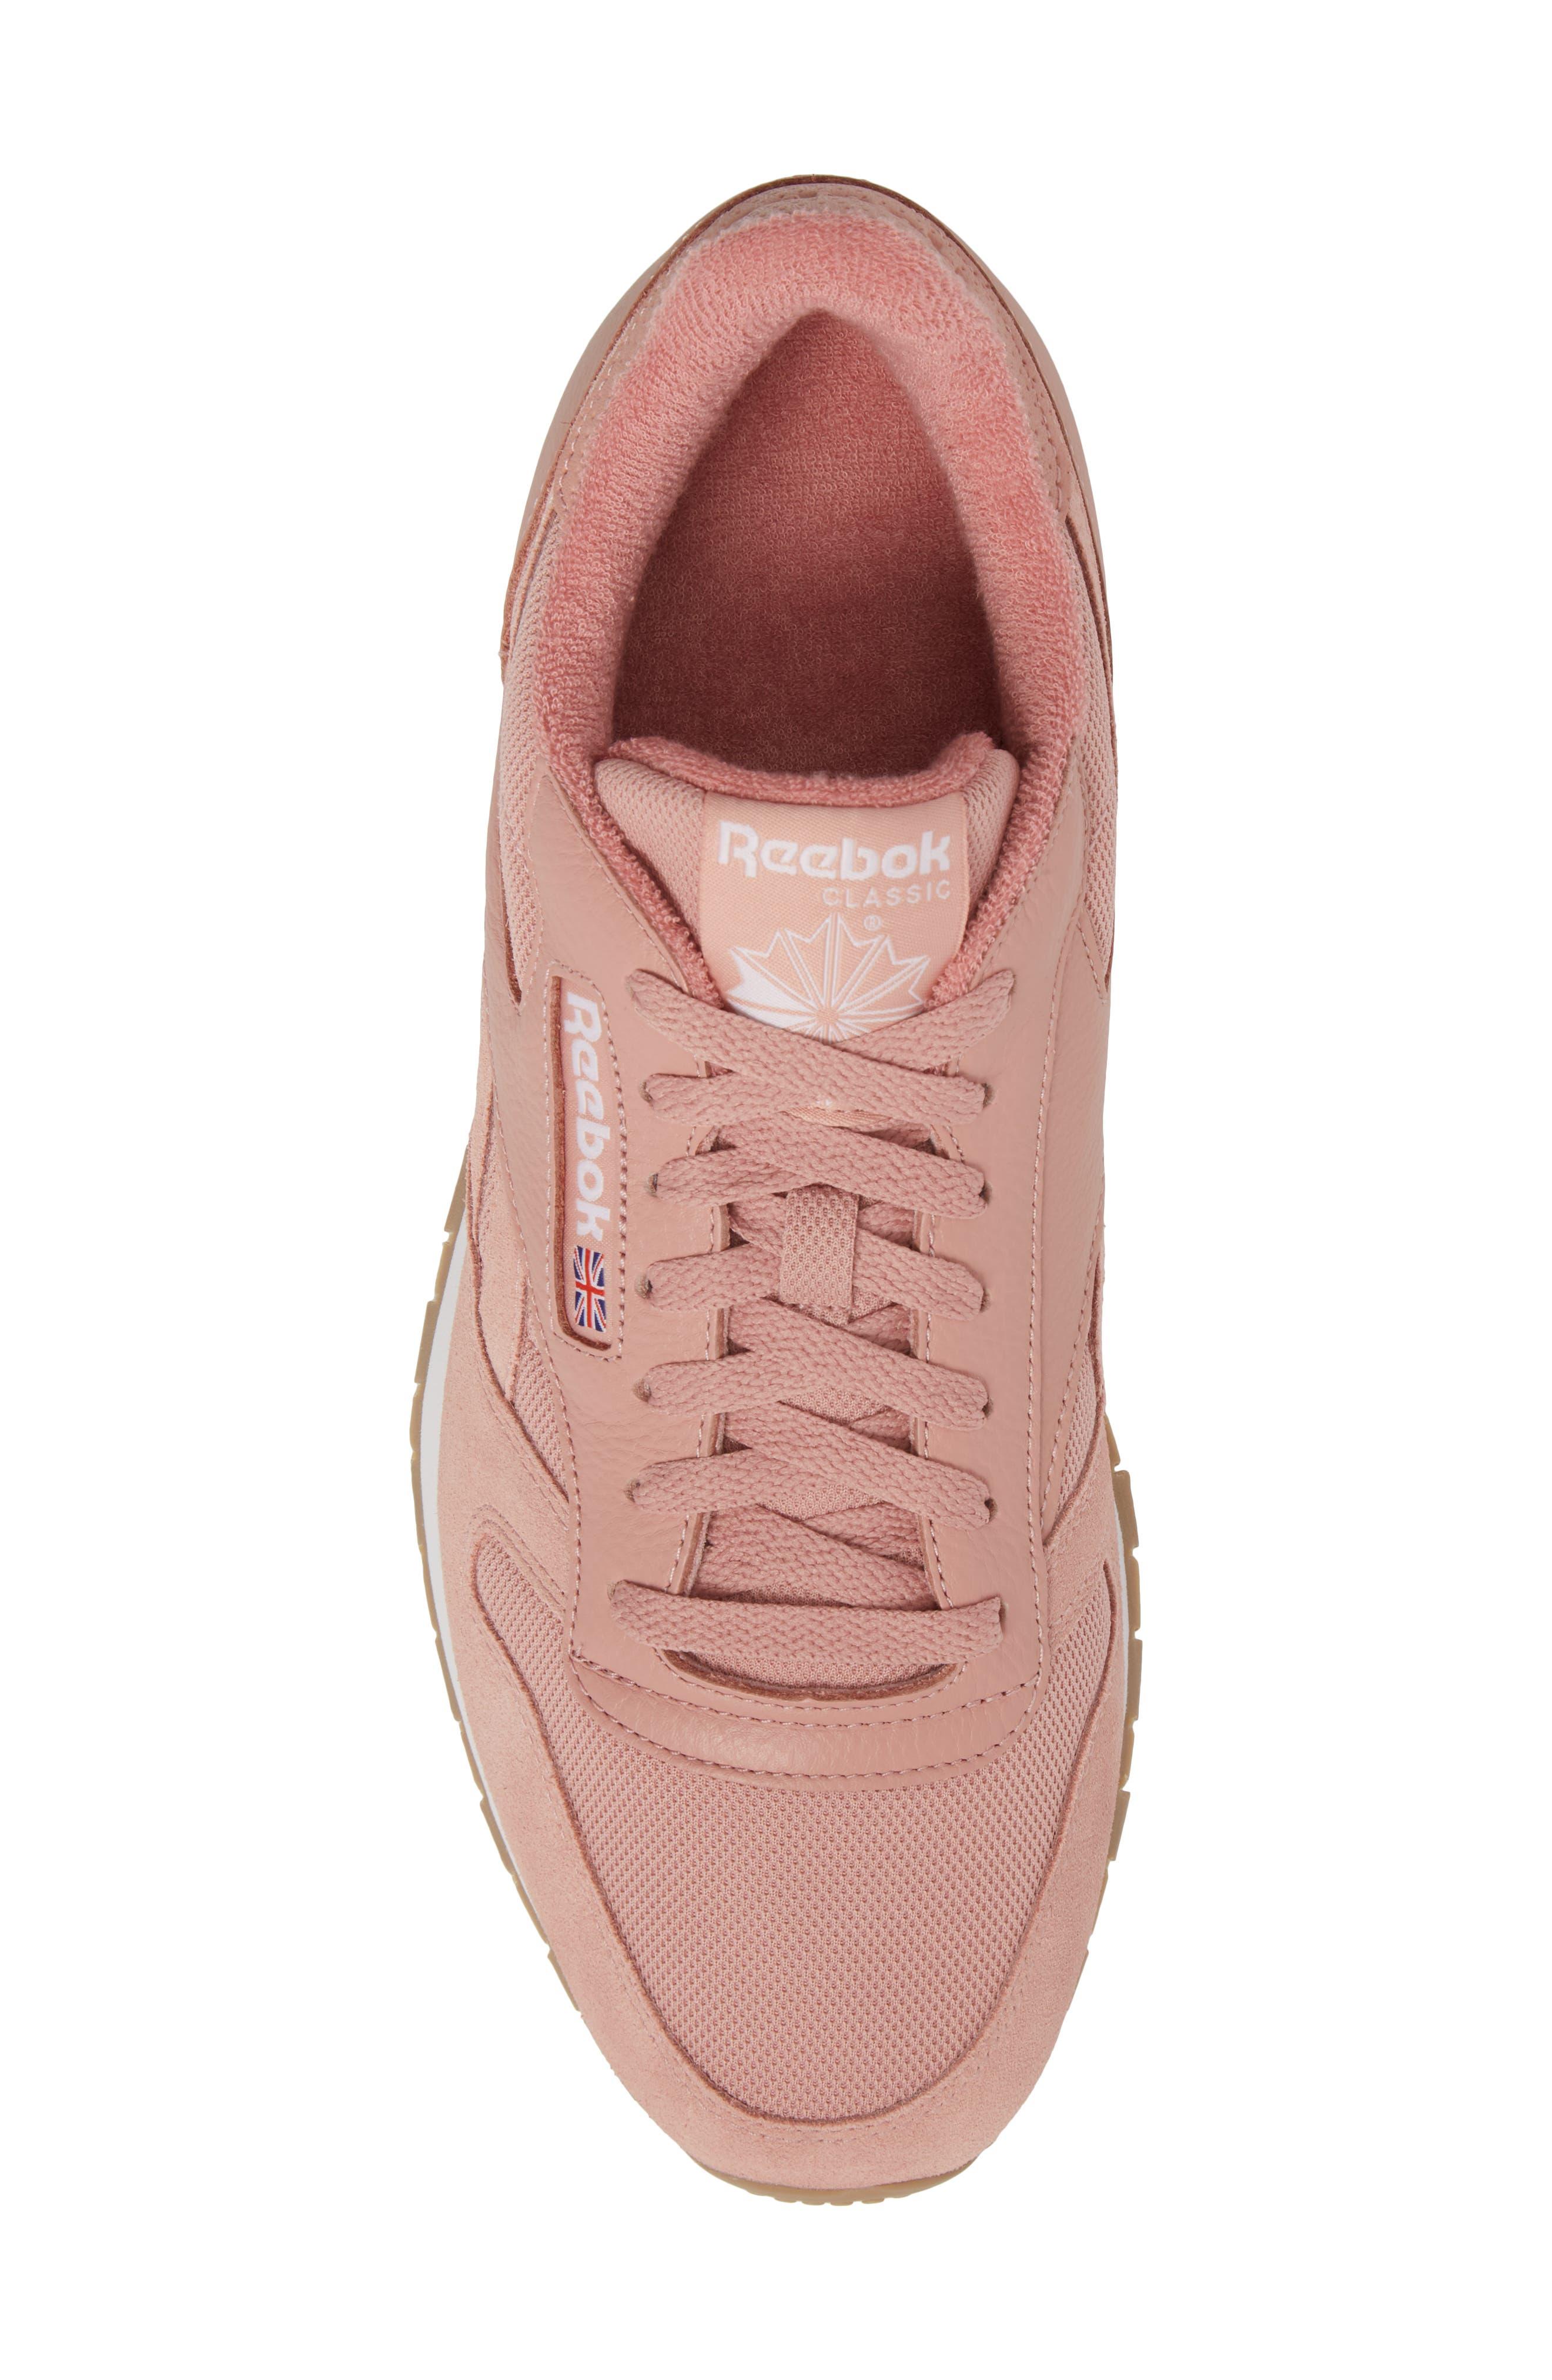 ESTL Classic Leather Sneaker,                             Alternate thumbnail 5, color,                             CHALK PINK/ WHITE